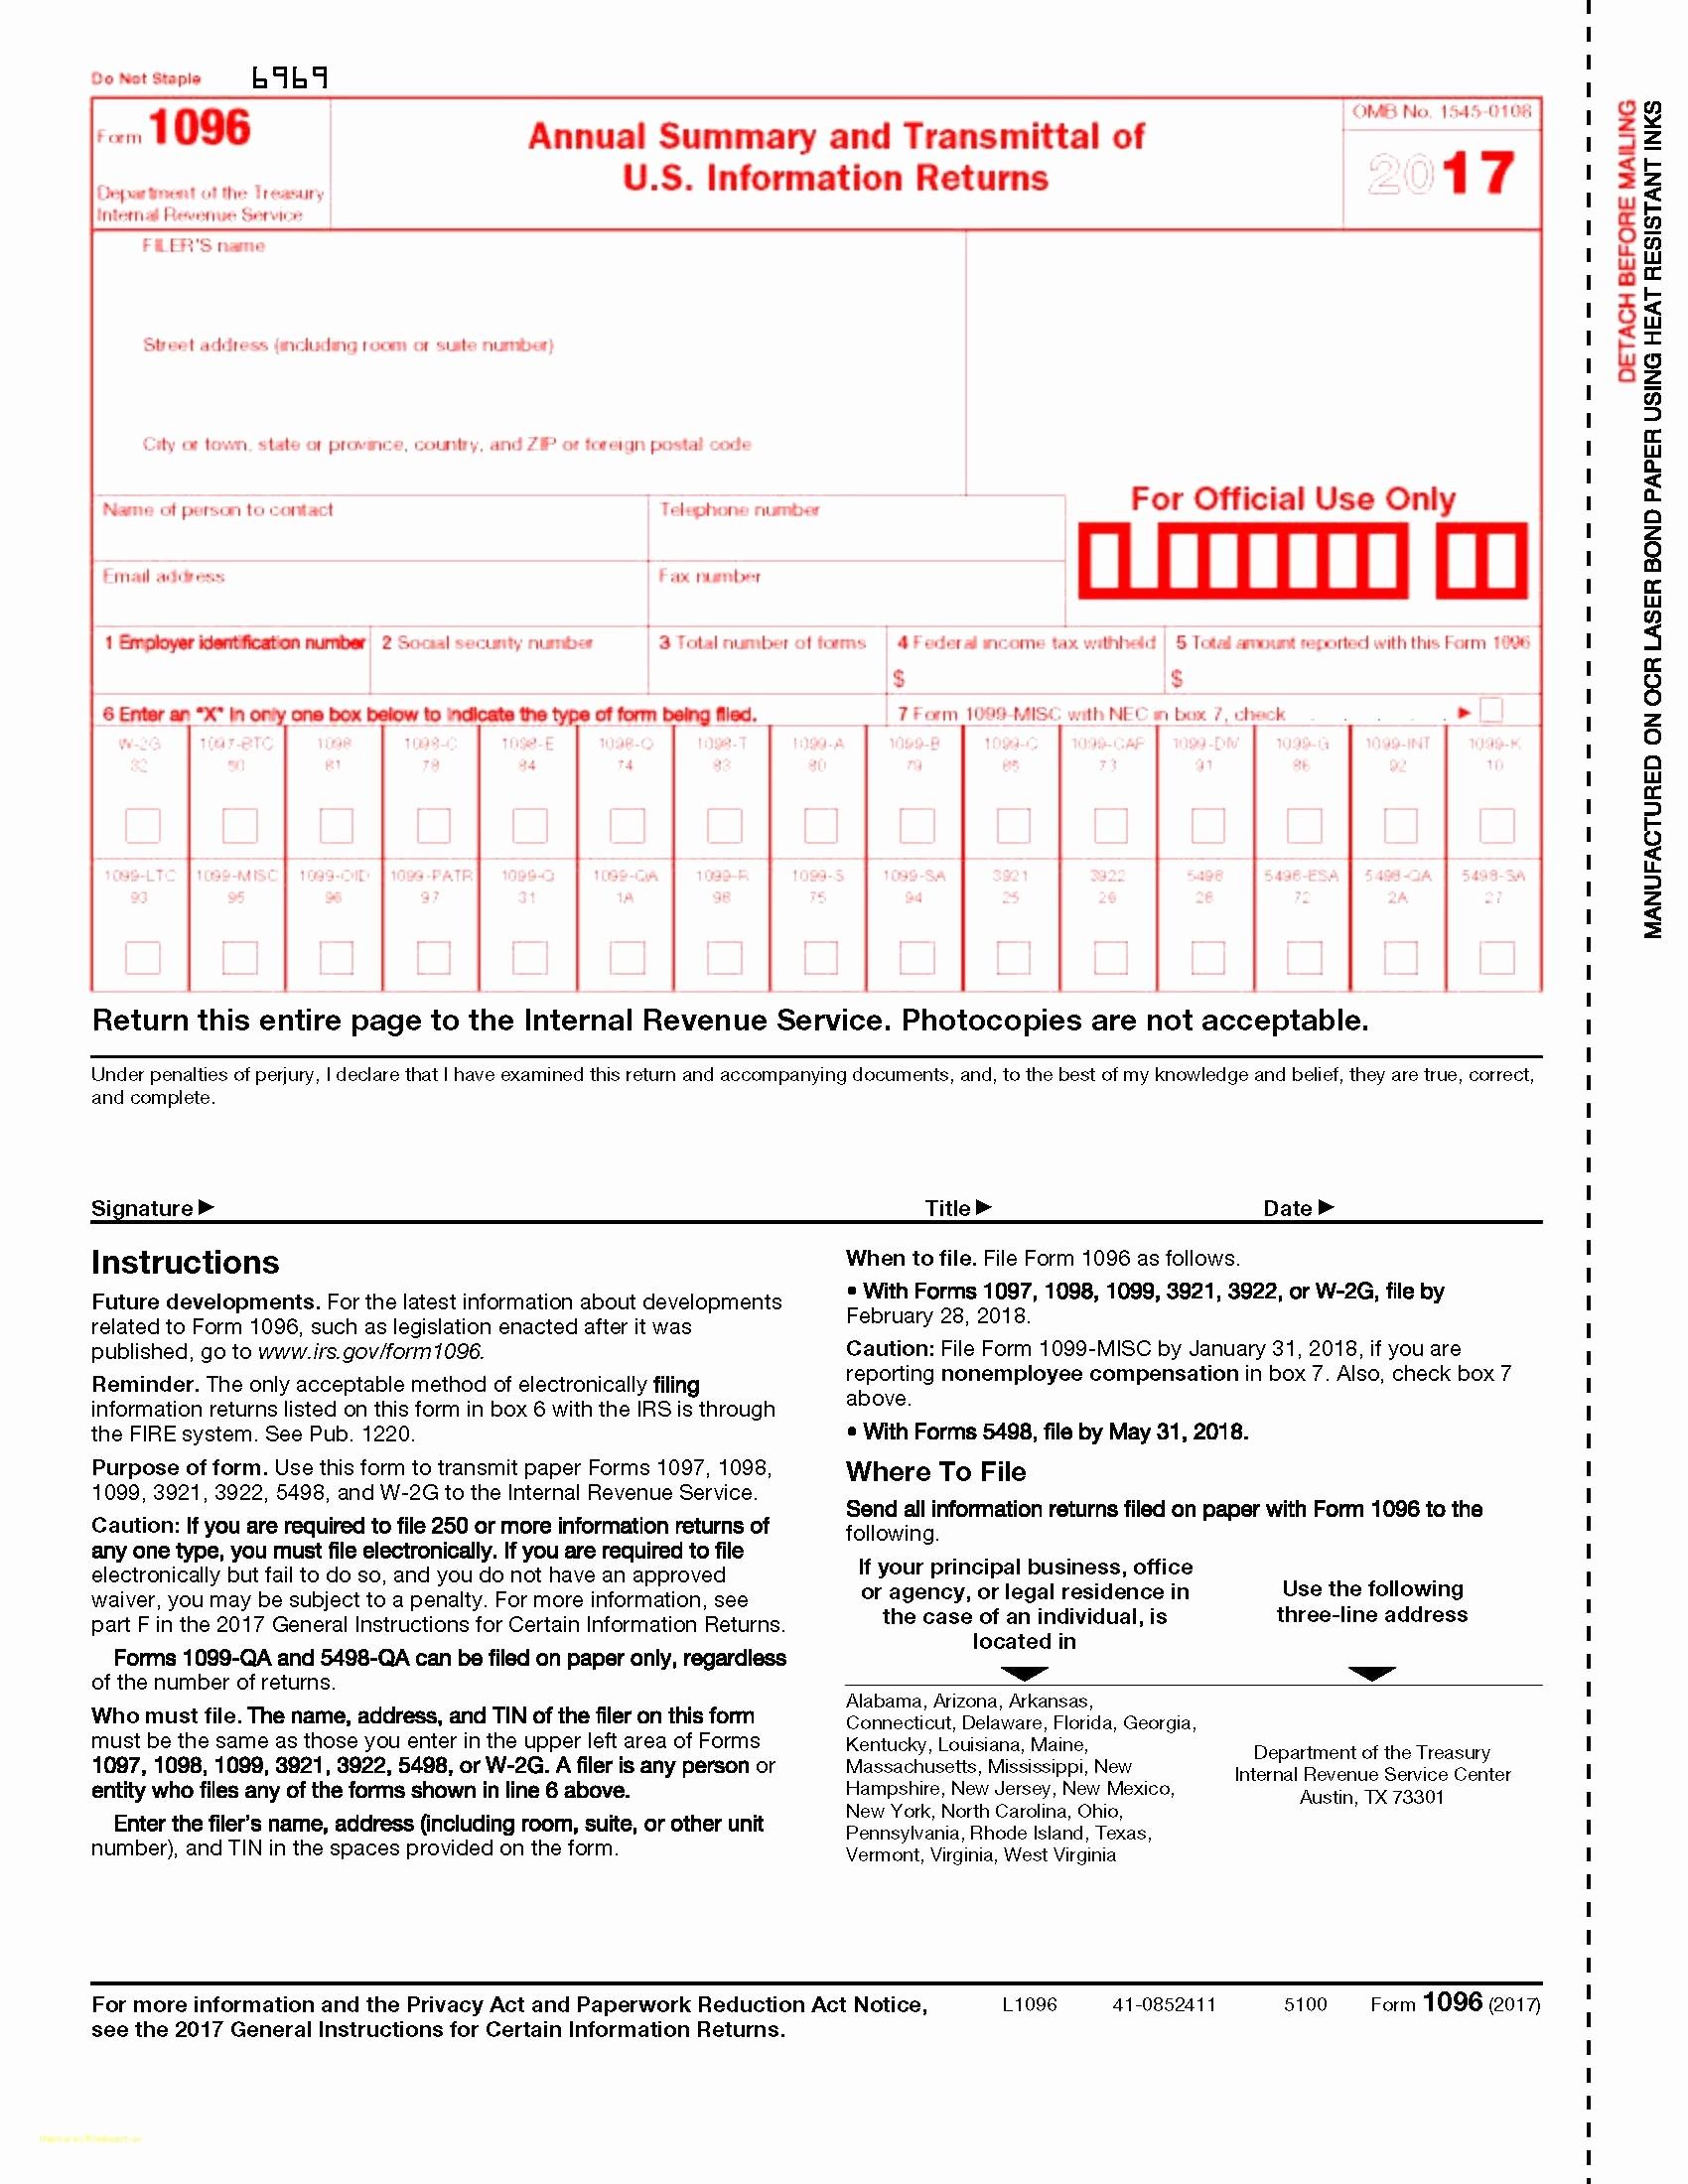 Free Printable 1096 Form 2015 Form 1096 Template 2015 Fresh Irs Form - Free Printable 1096 Form 2015